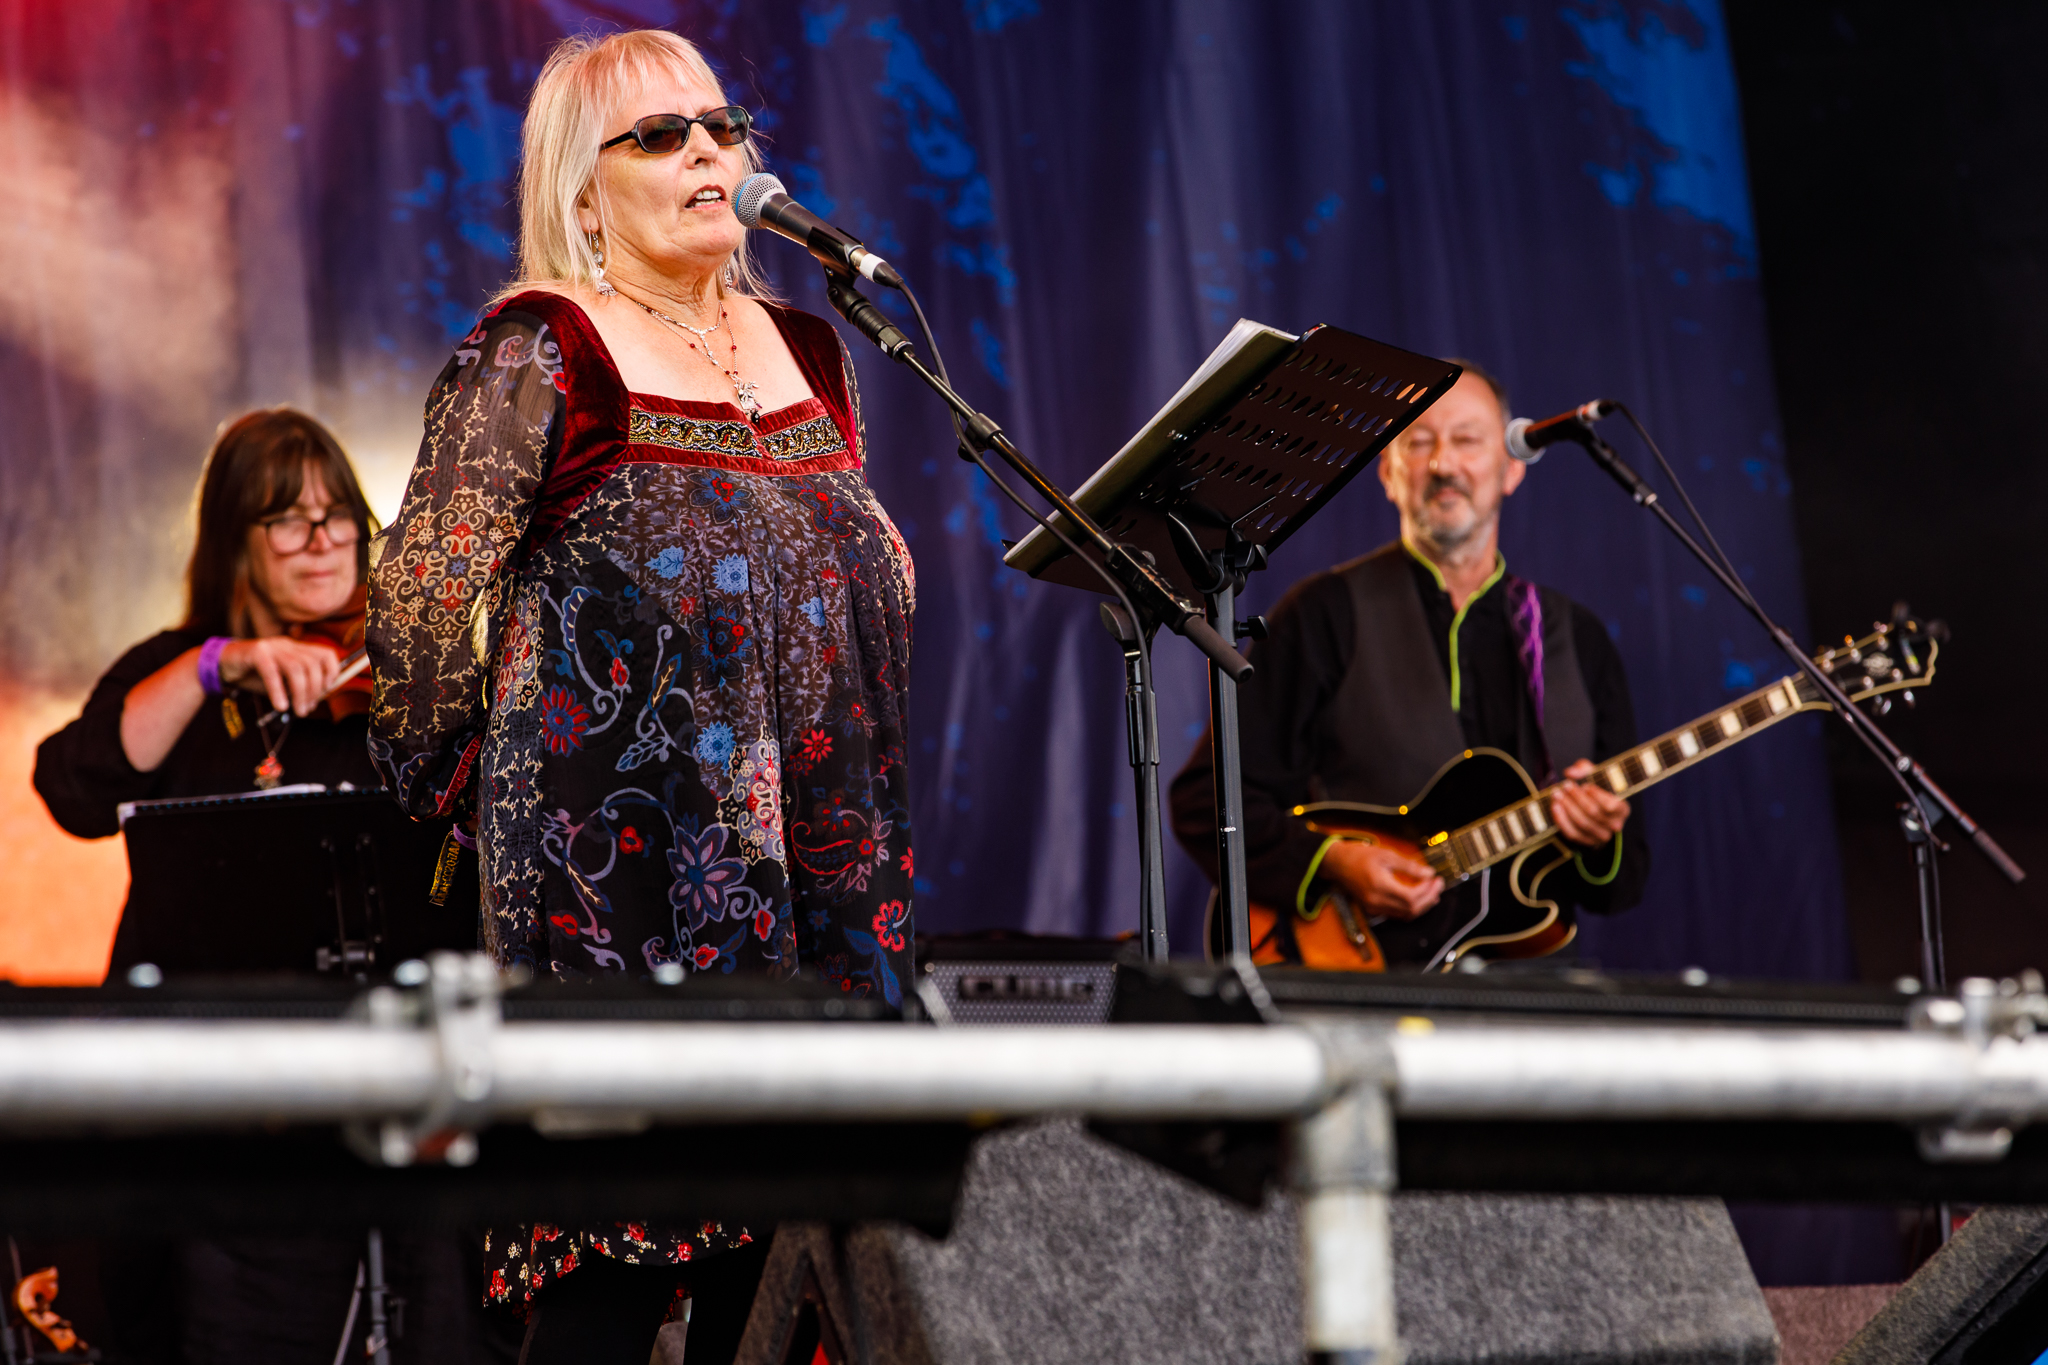 Judy Dyble at Fairport's Cropredy Convention (photo by Matt Condon / @arcane93)